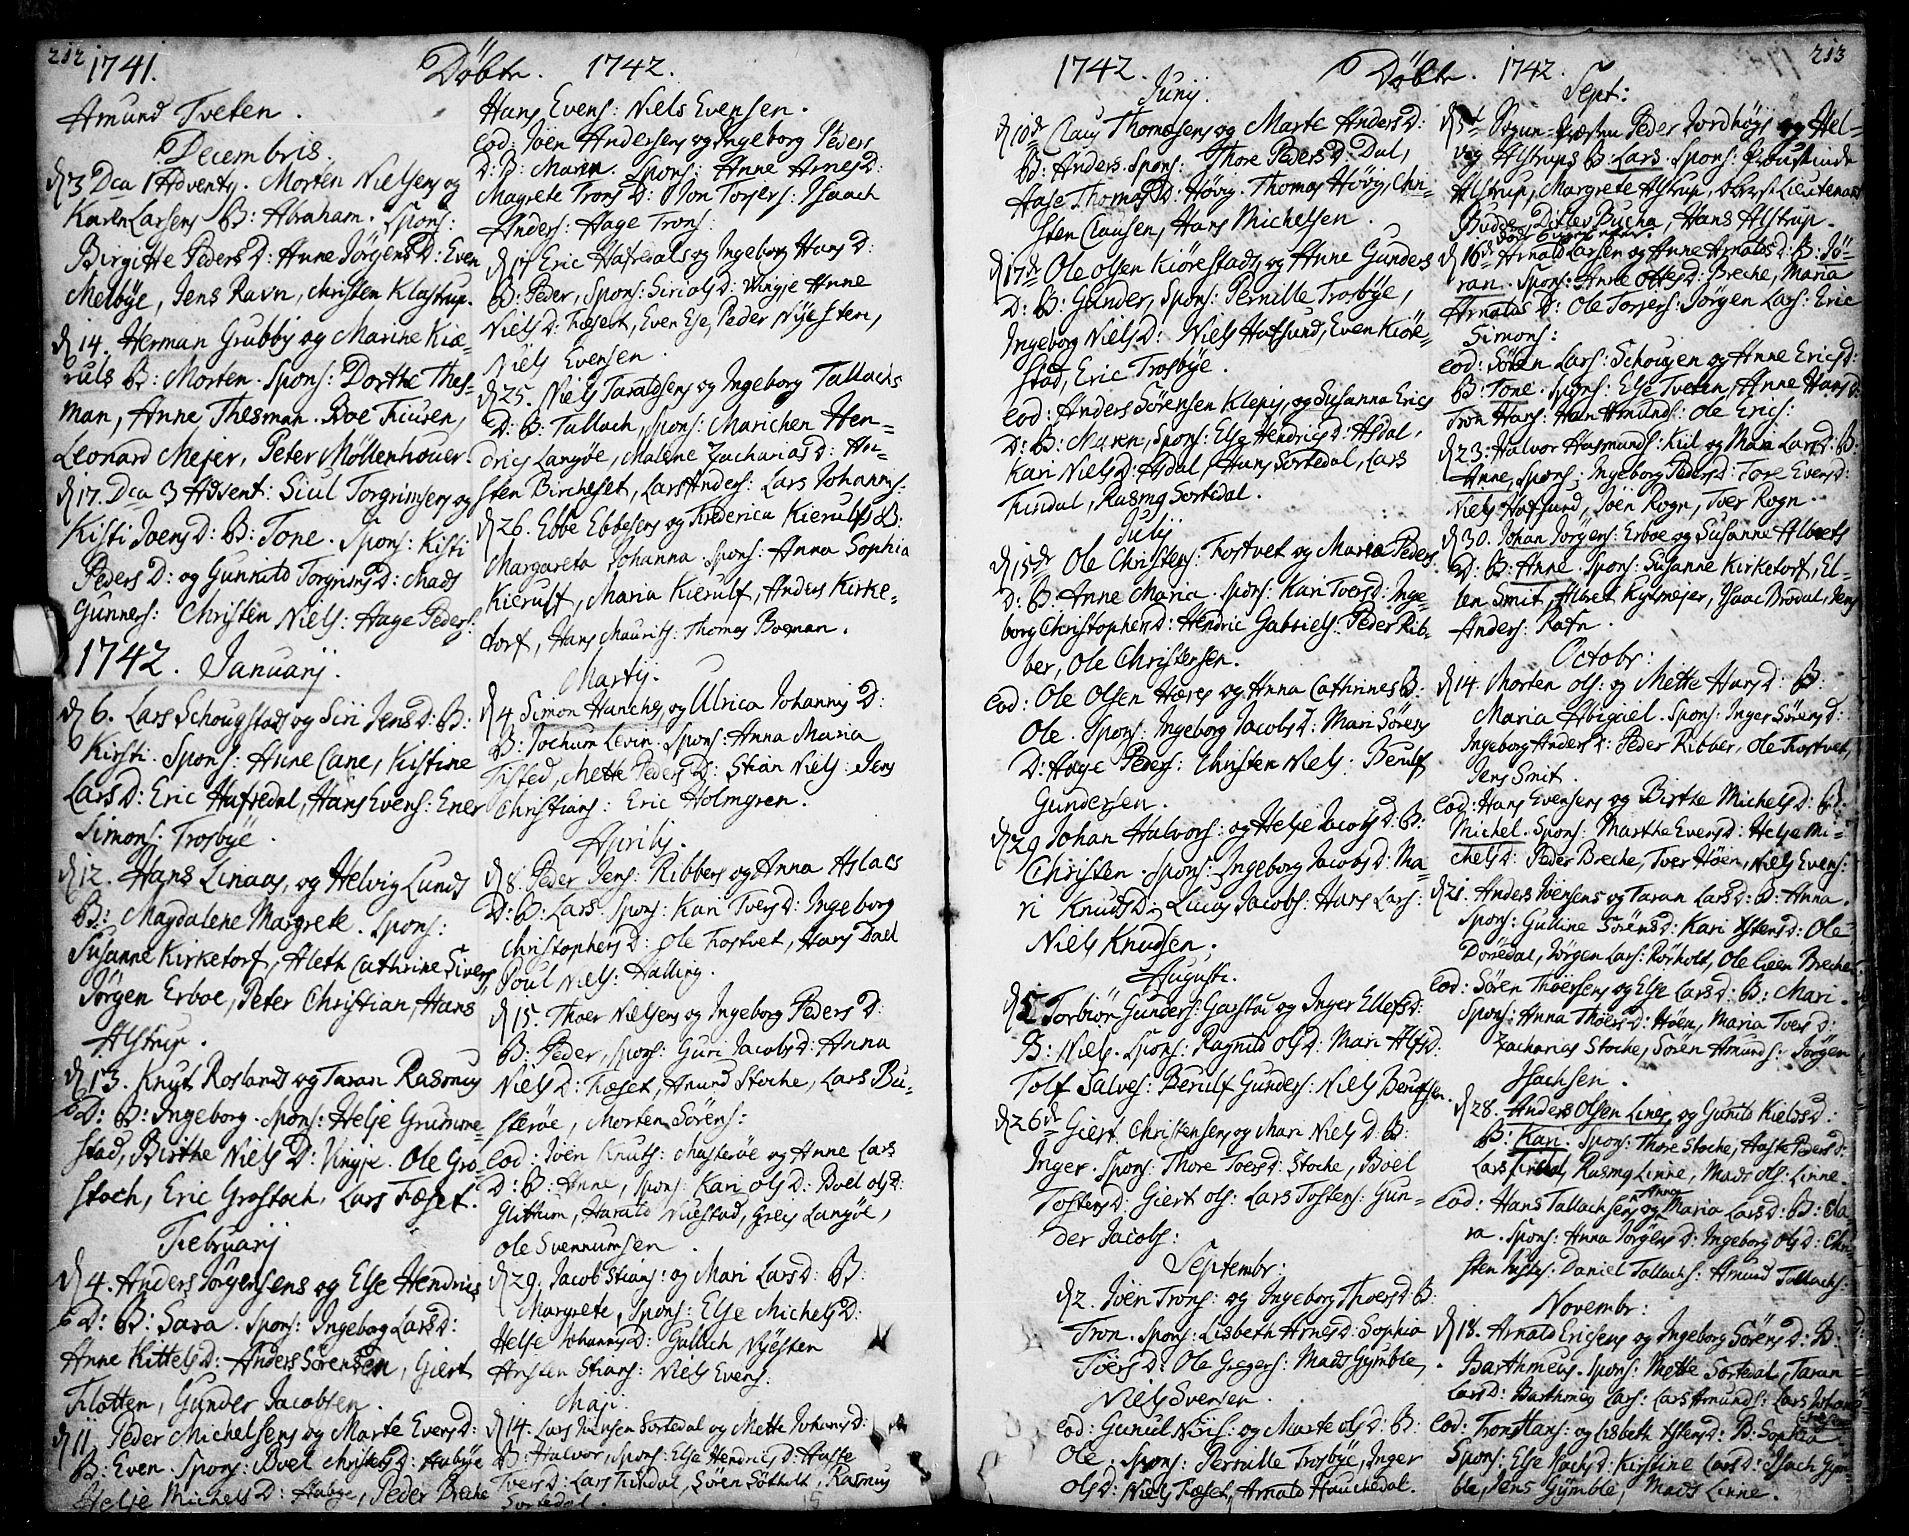 SAKO, Bamble kirkebøker, F/Fa/L0001: Ministerialbok nr. I 1, 1702-1774, s. 212-213